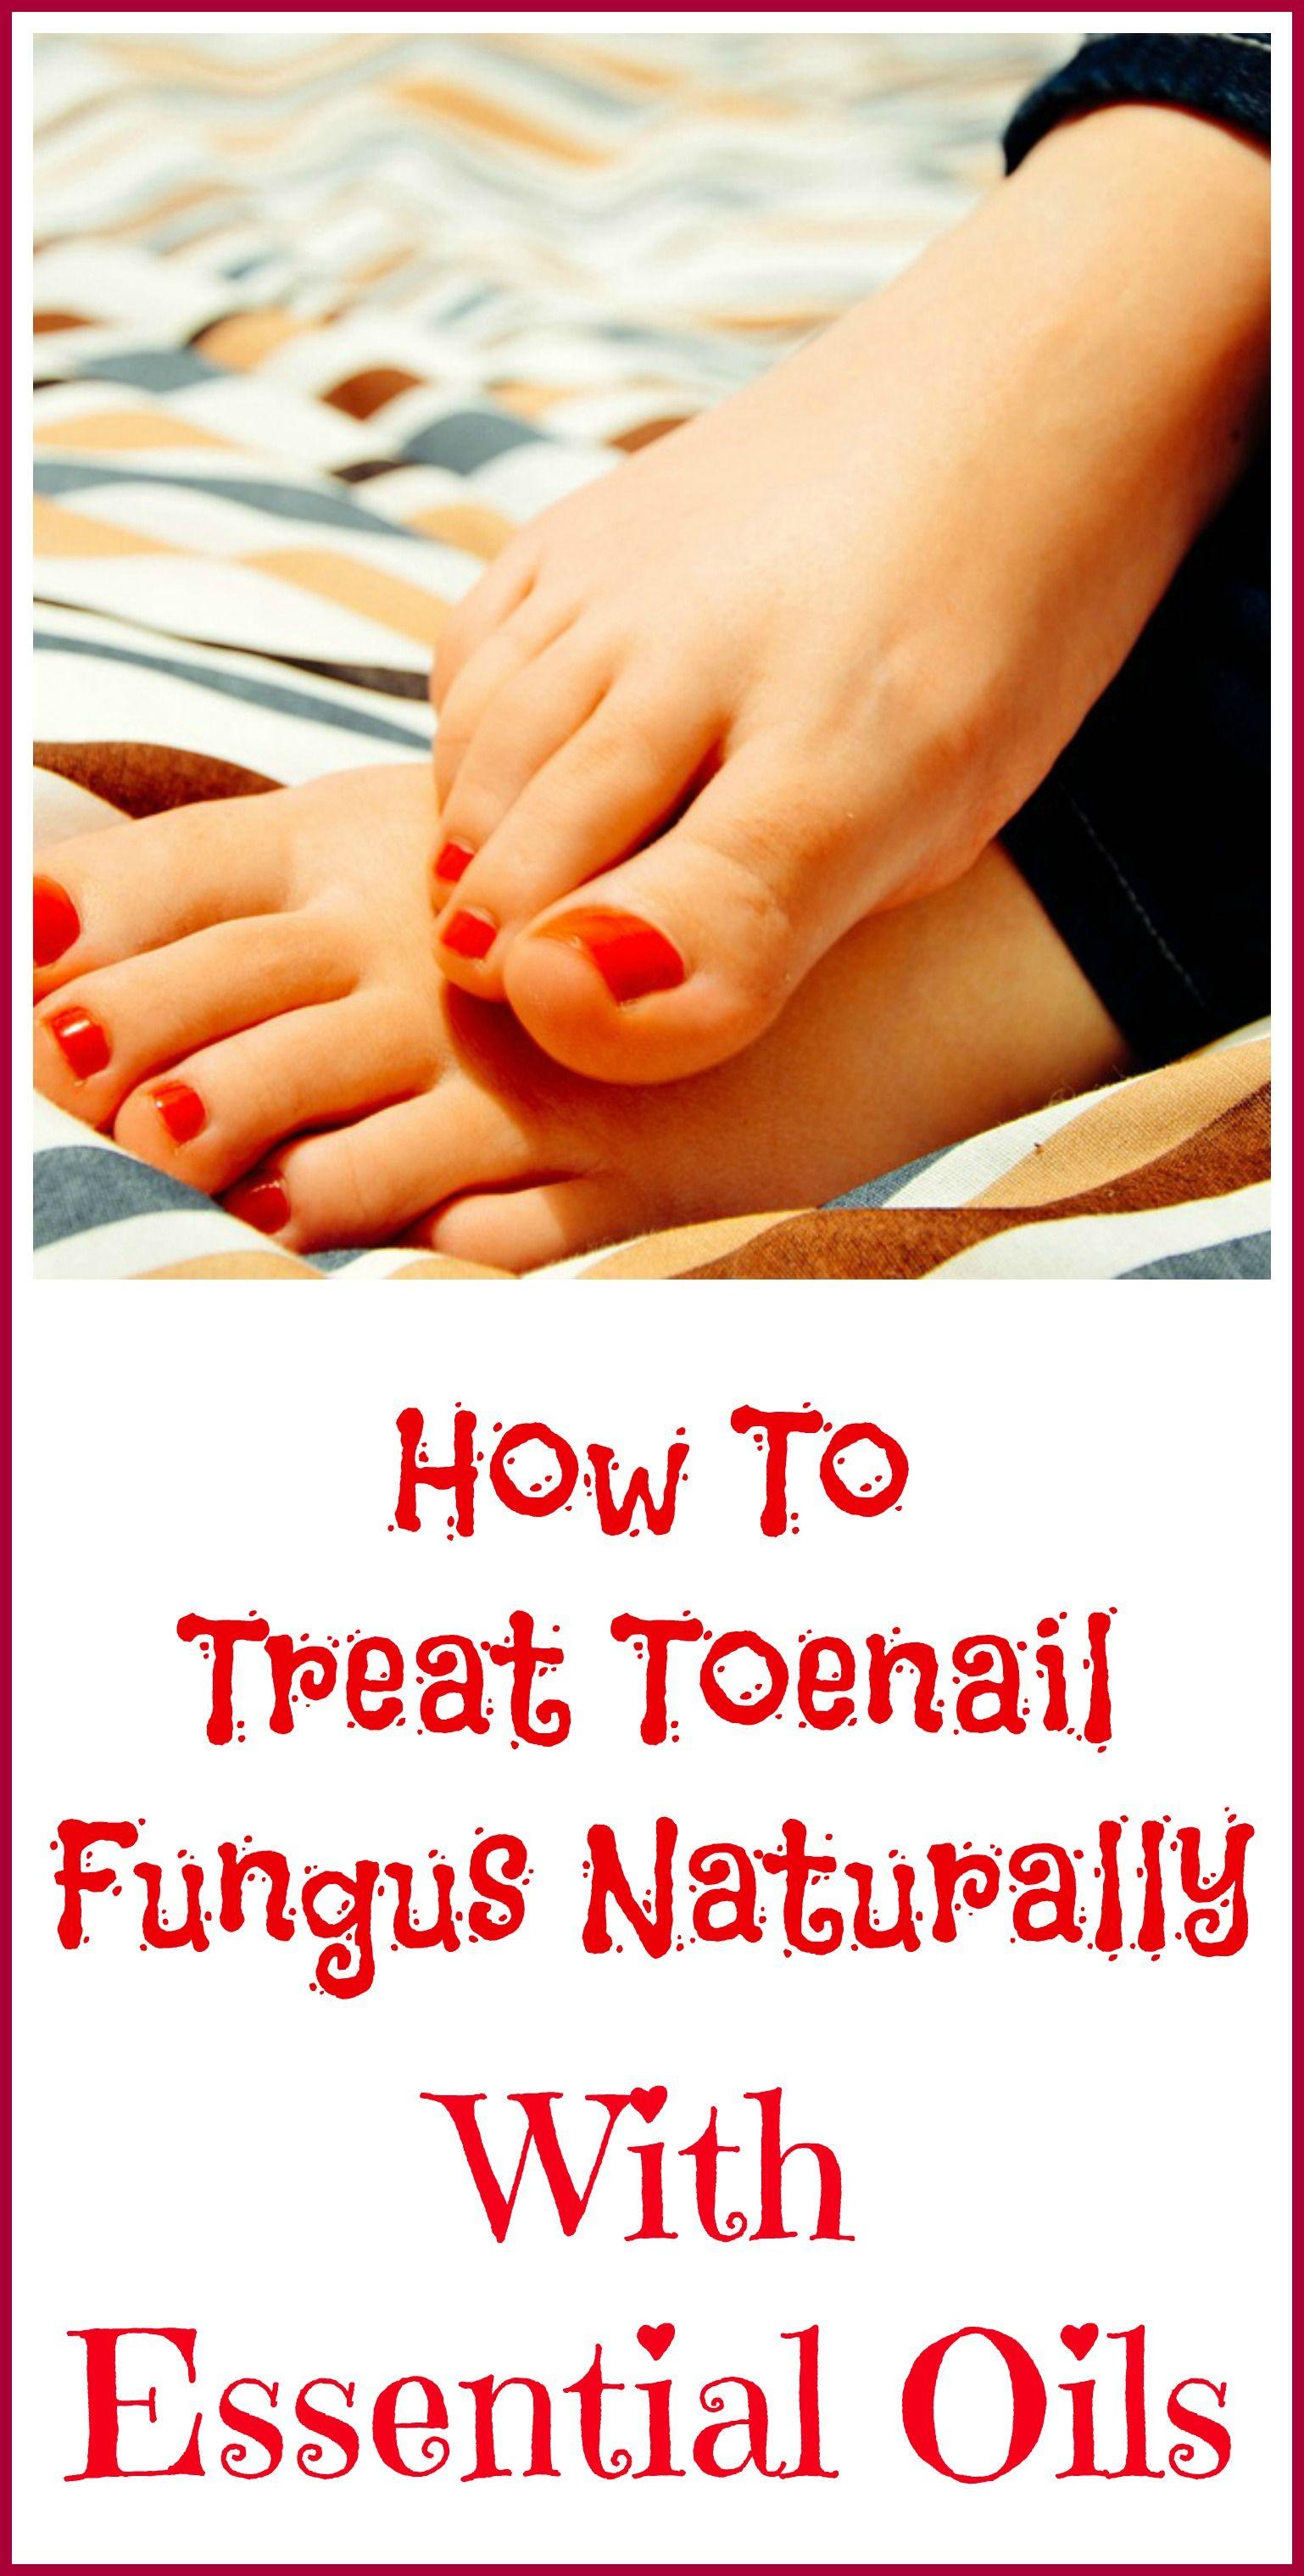 Essential Oils Good For Toenail Fungus | Healing with Essential Oils ...